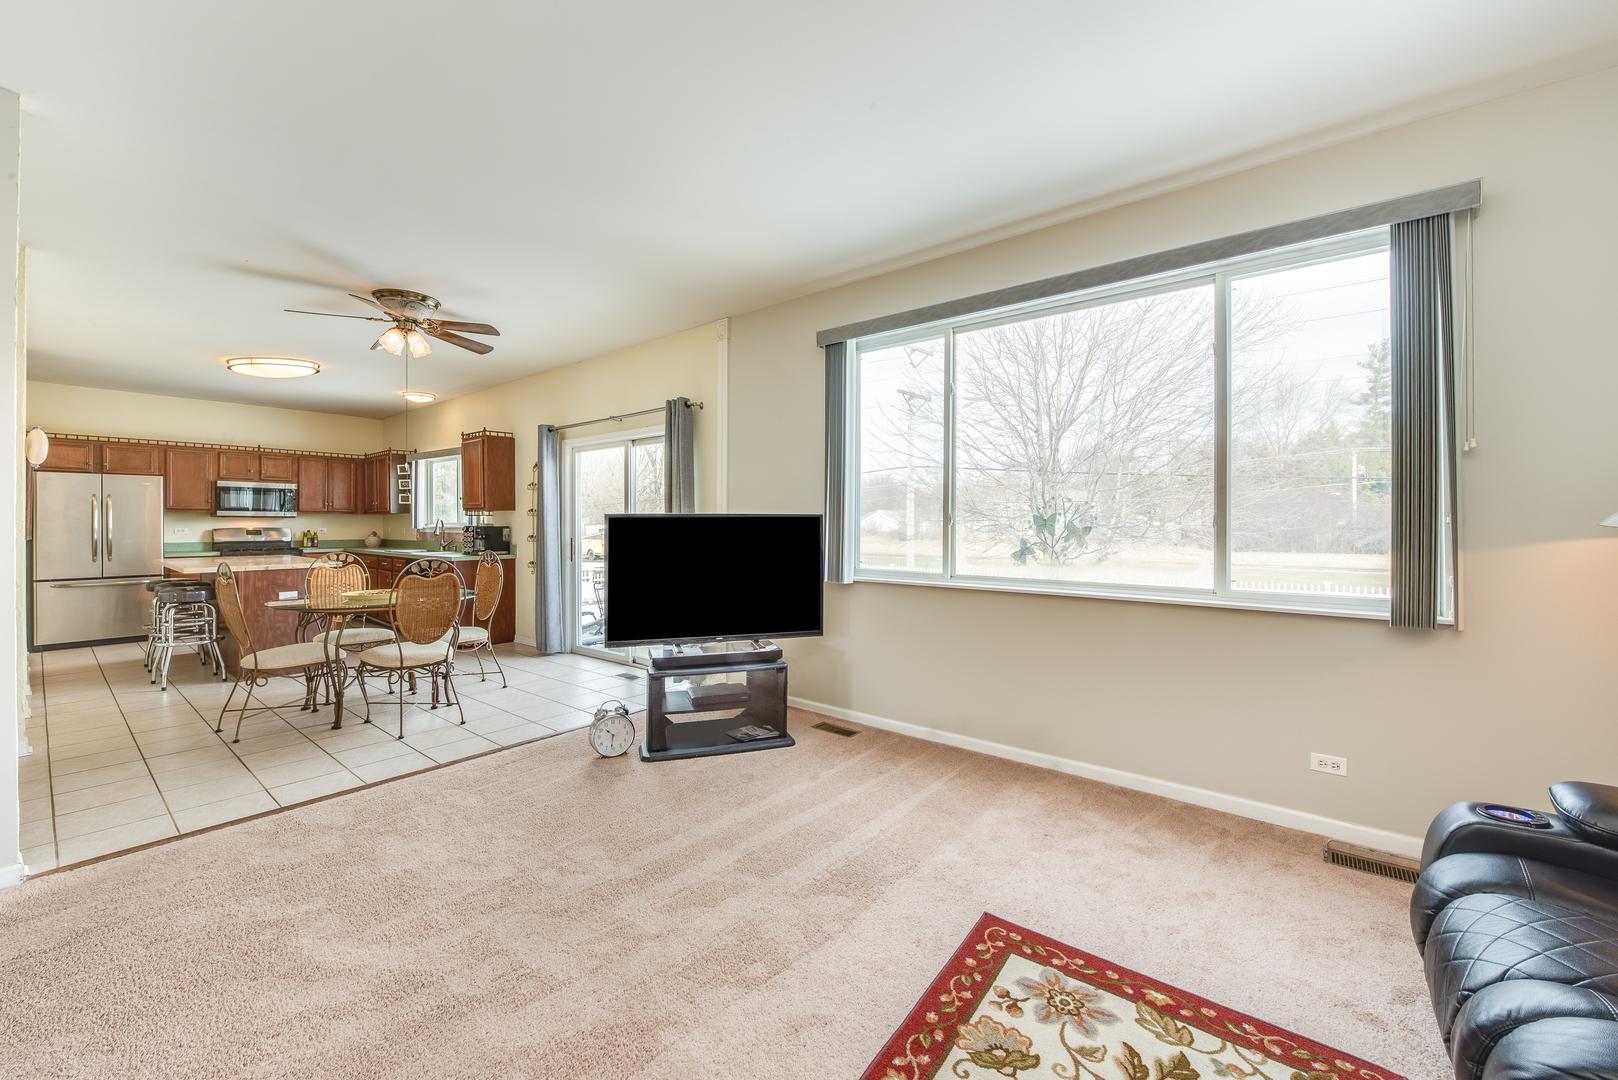 617 Charolotte, Oswego, Illinois, 60543